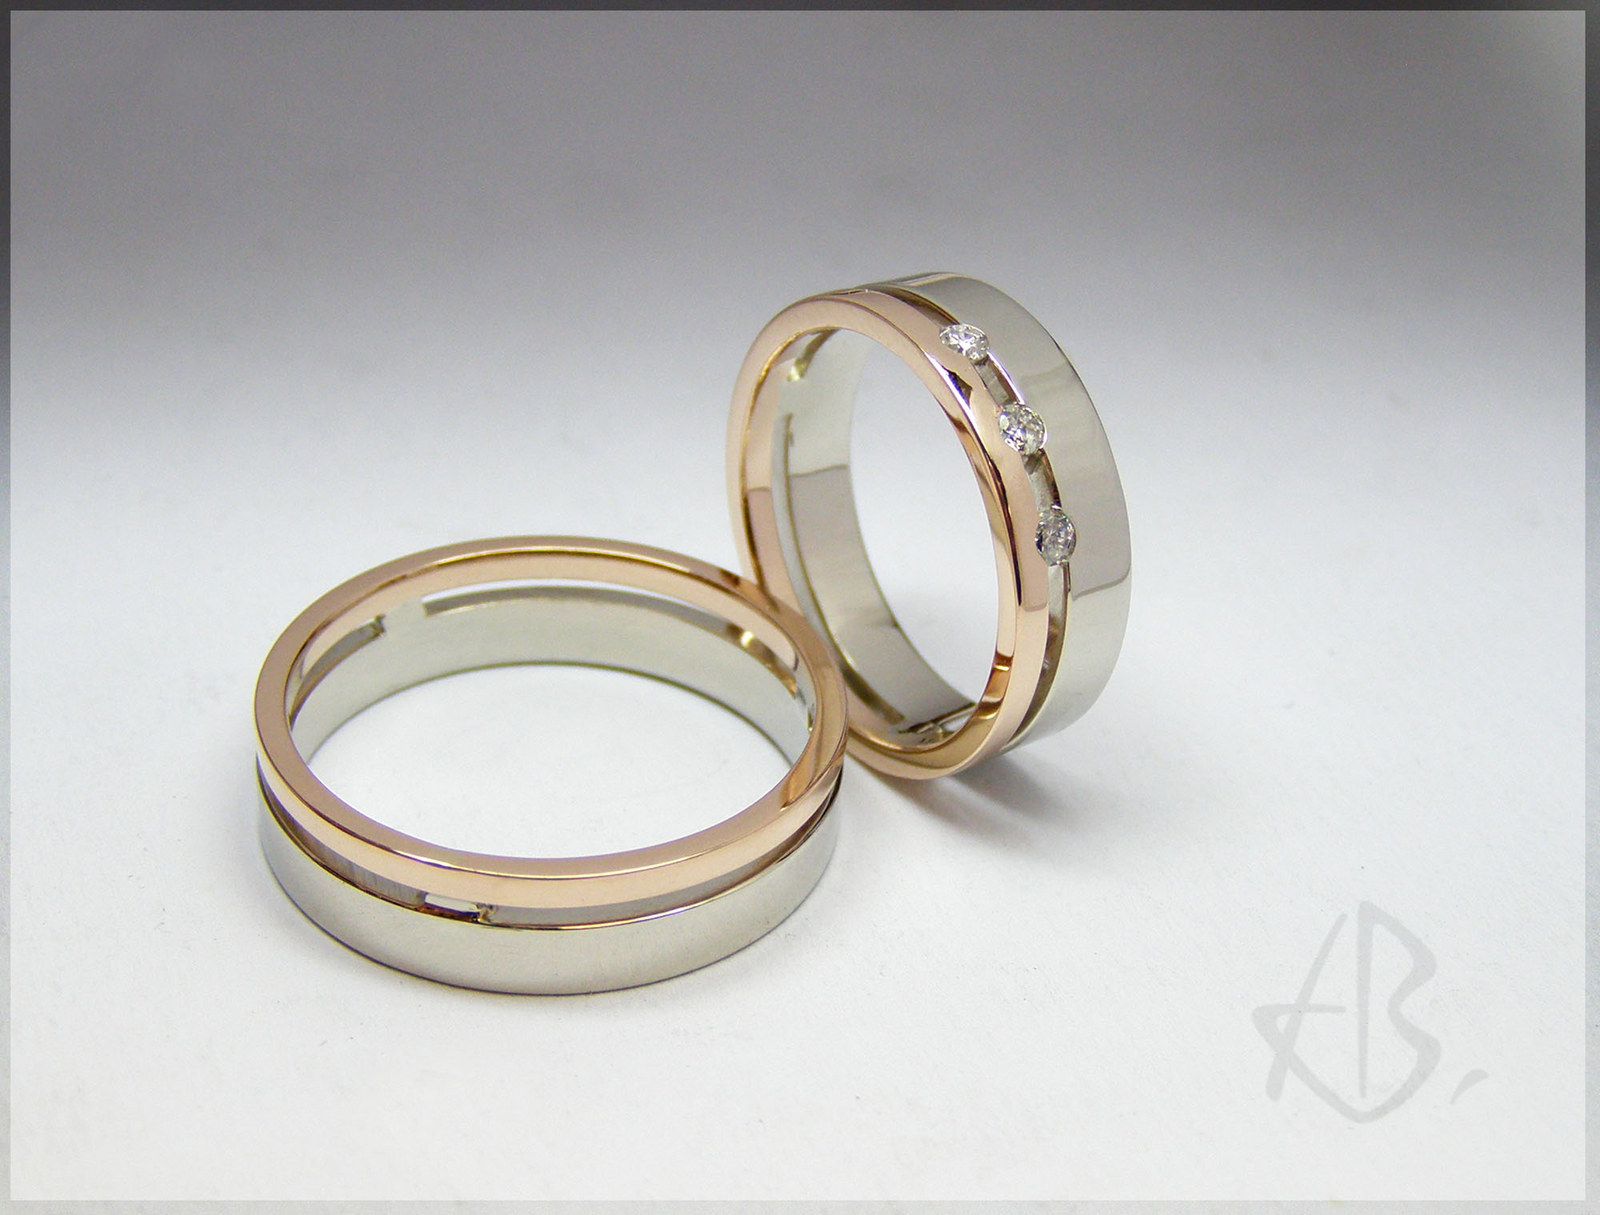 Snubni Prsteny Bile A Cervene Zlato Zbozi Prodejce Ales Bartos